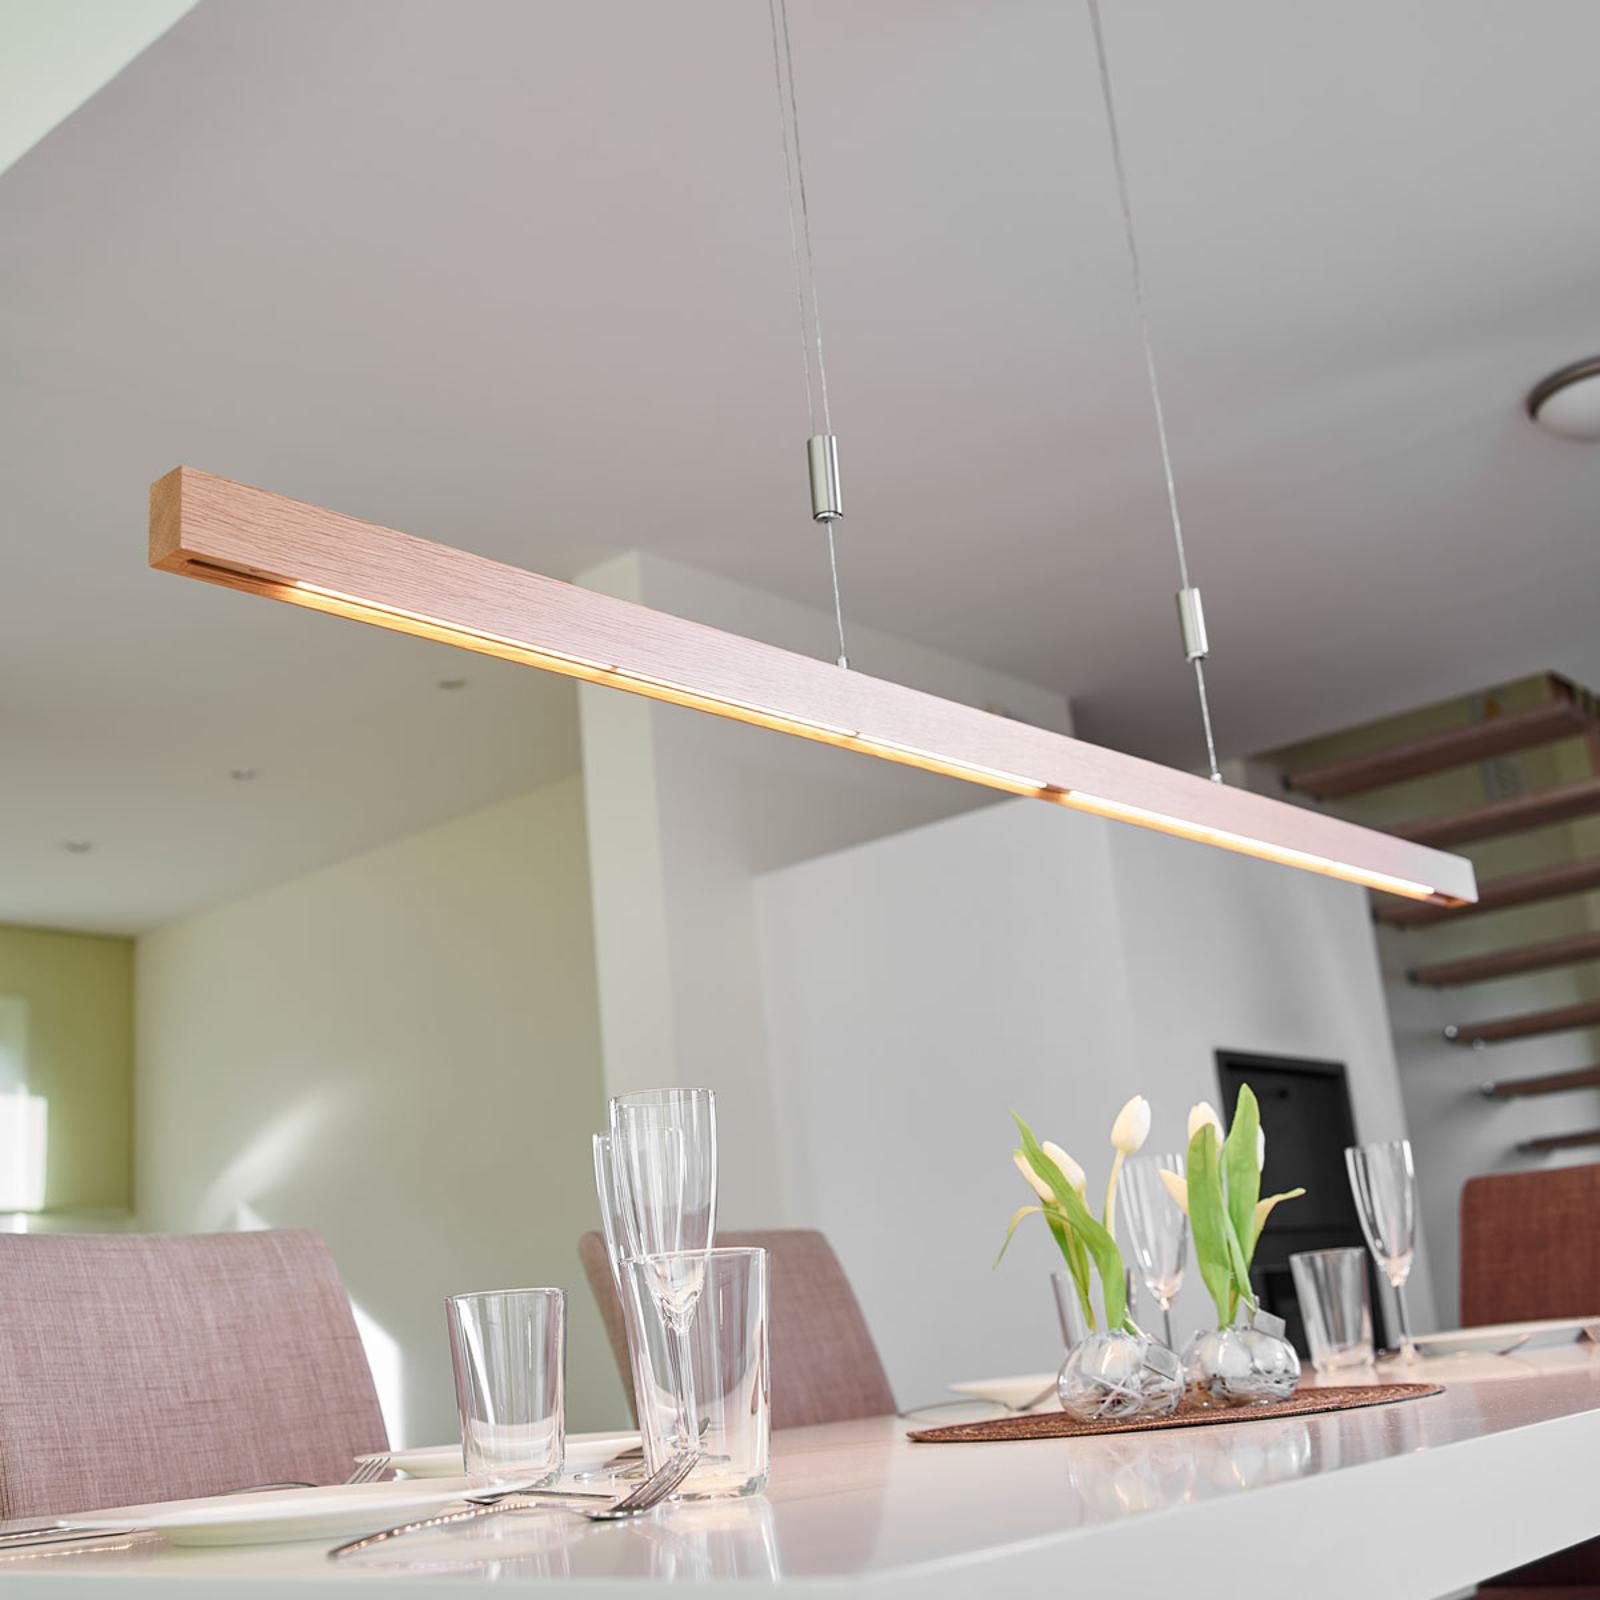 LED-bjelkependellampe i eiketre Nora - 158 cm